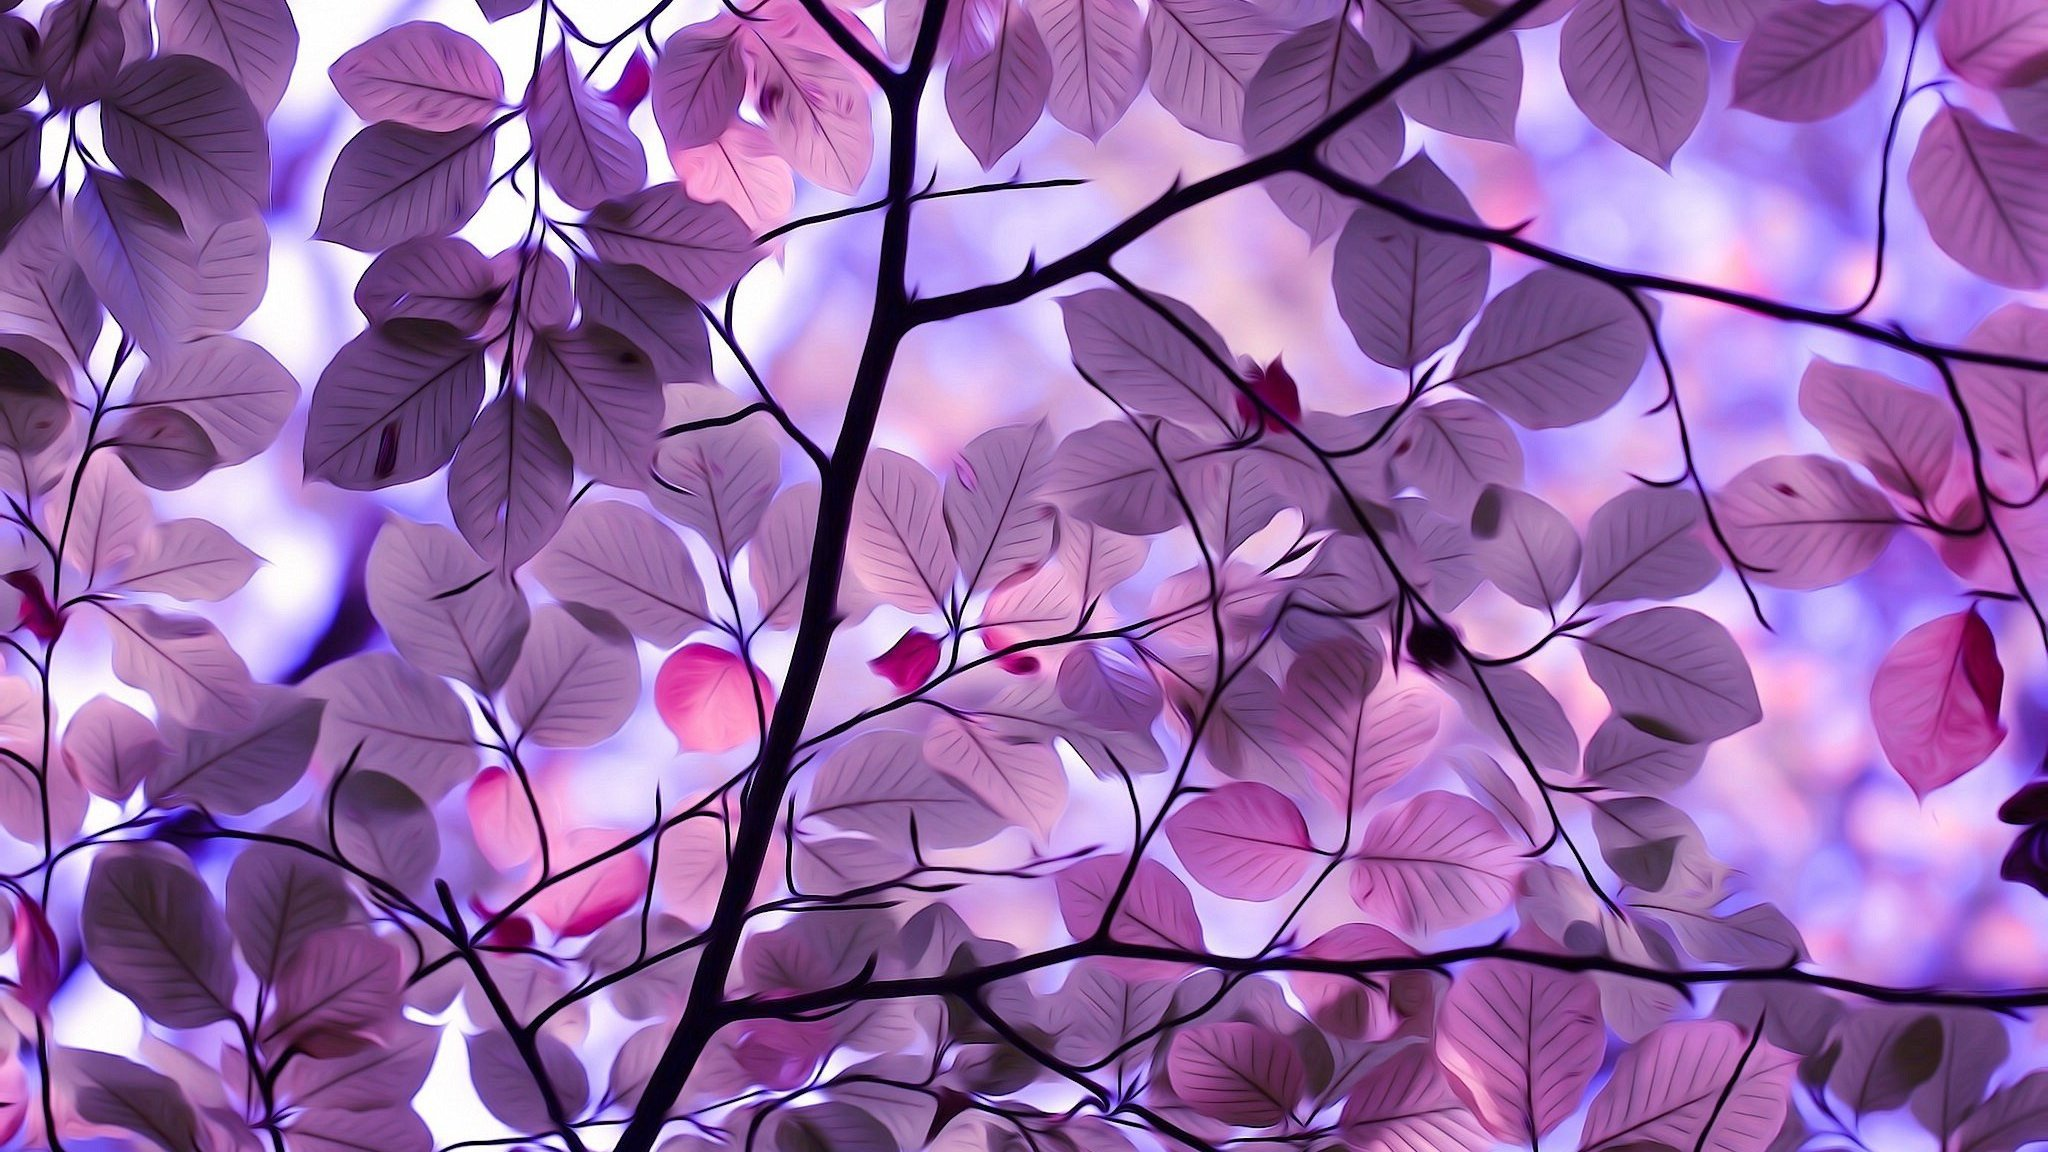 2048x1152 Purple Leaves 2048x1152 Resolution HD 4k Wallpapers ...